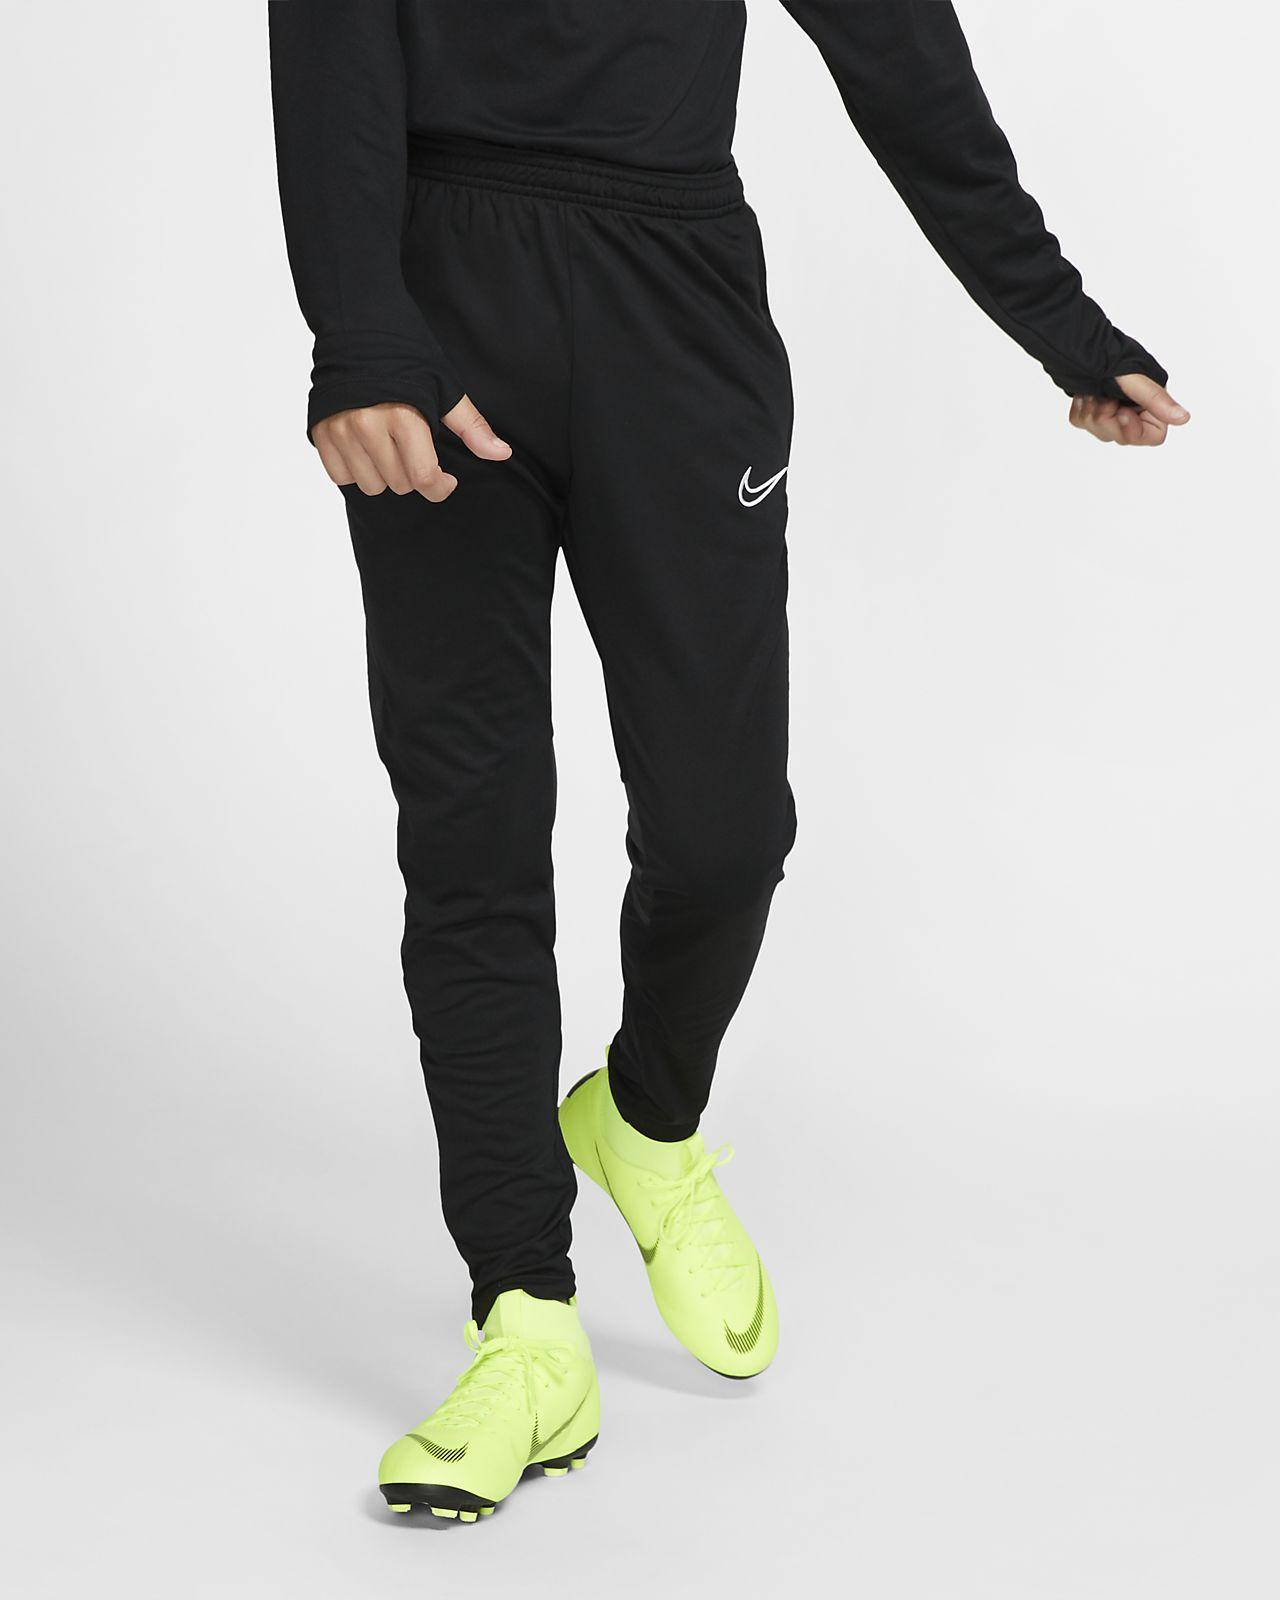 Nike Dri-FIT Academy-fodboldbukser til store børn